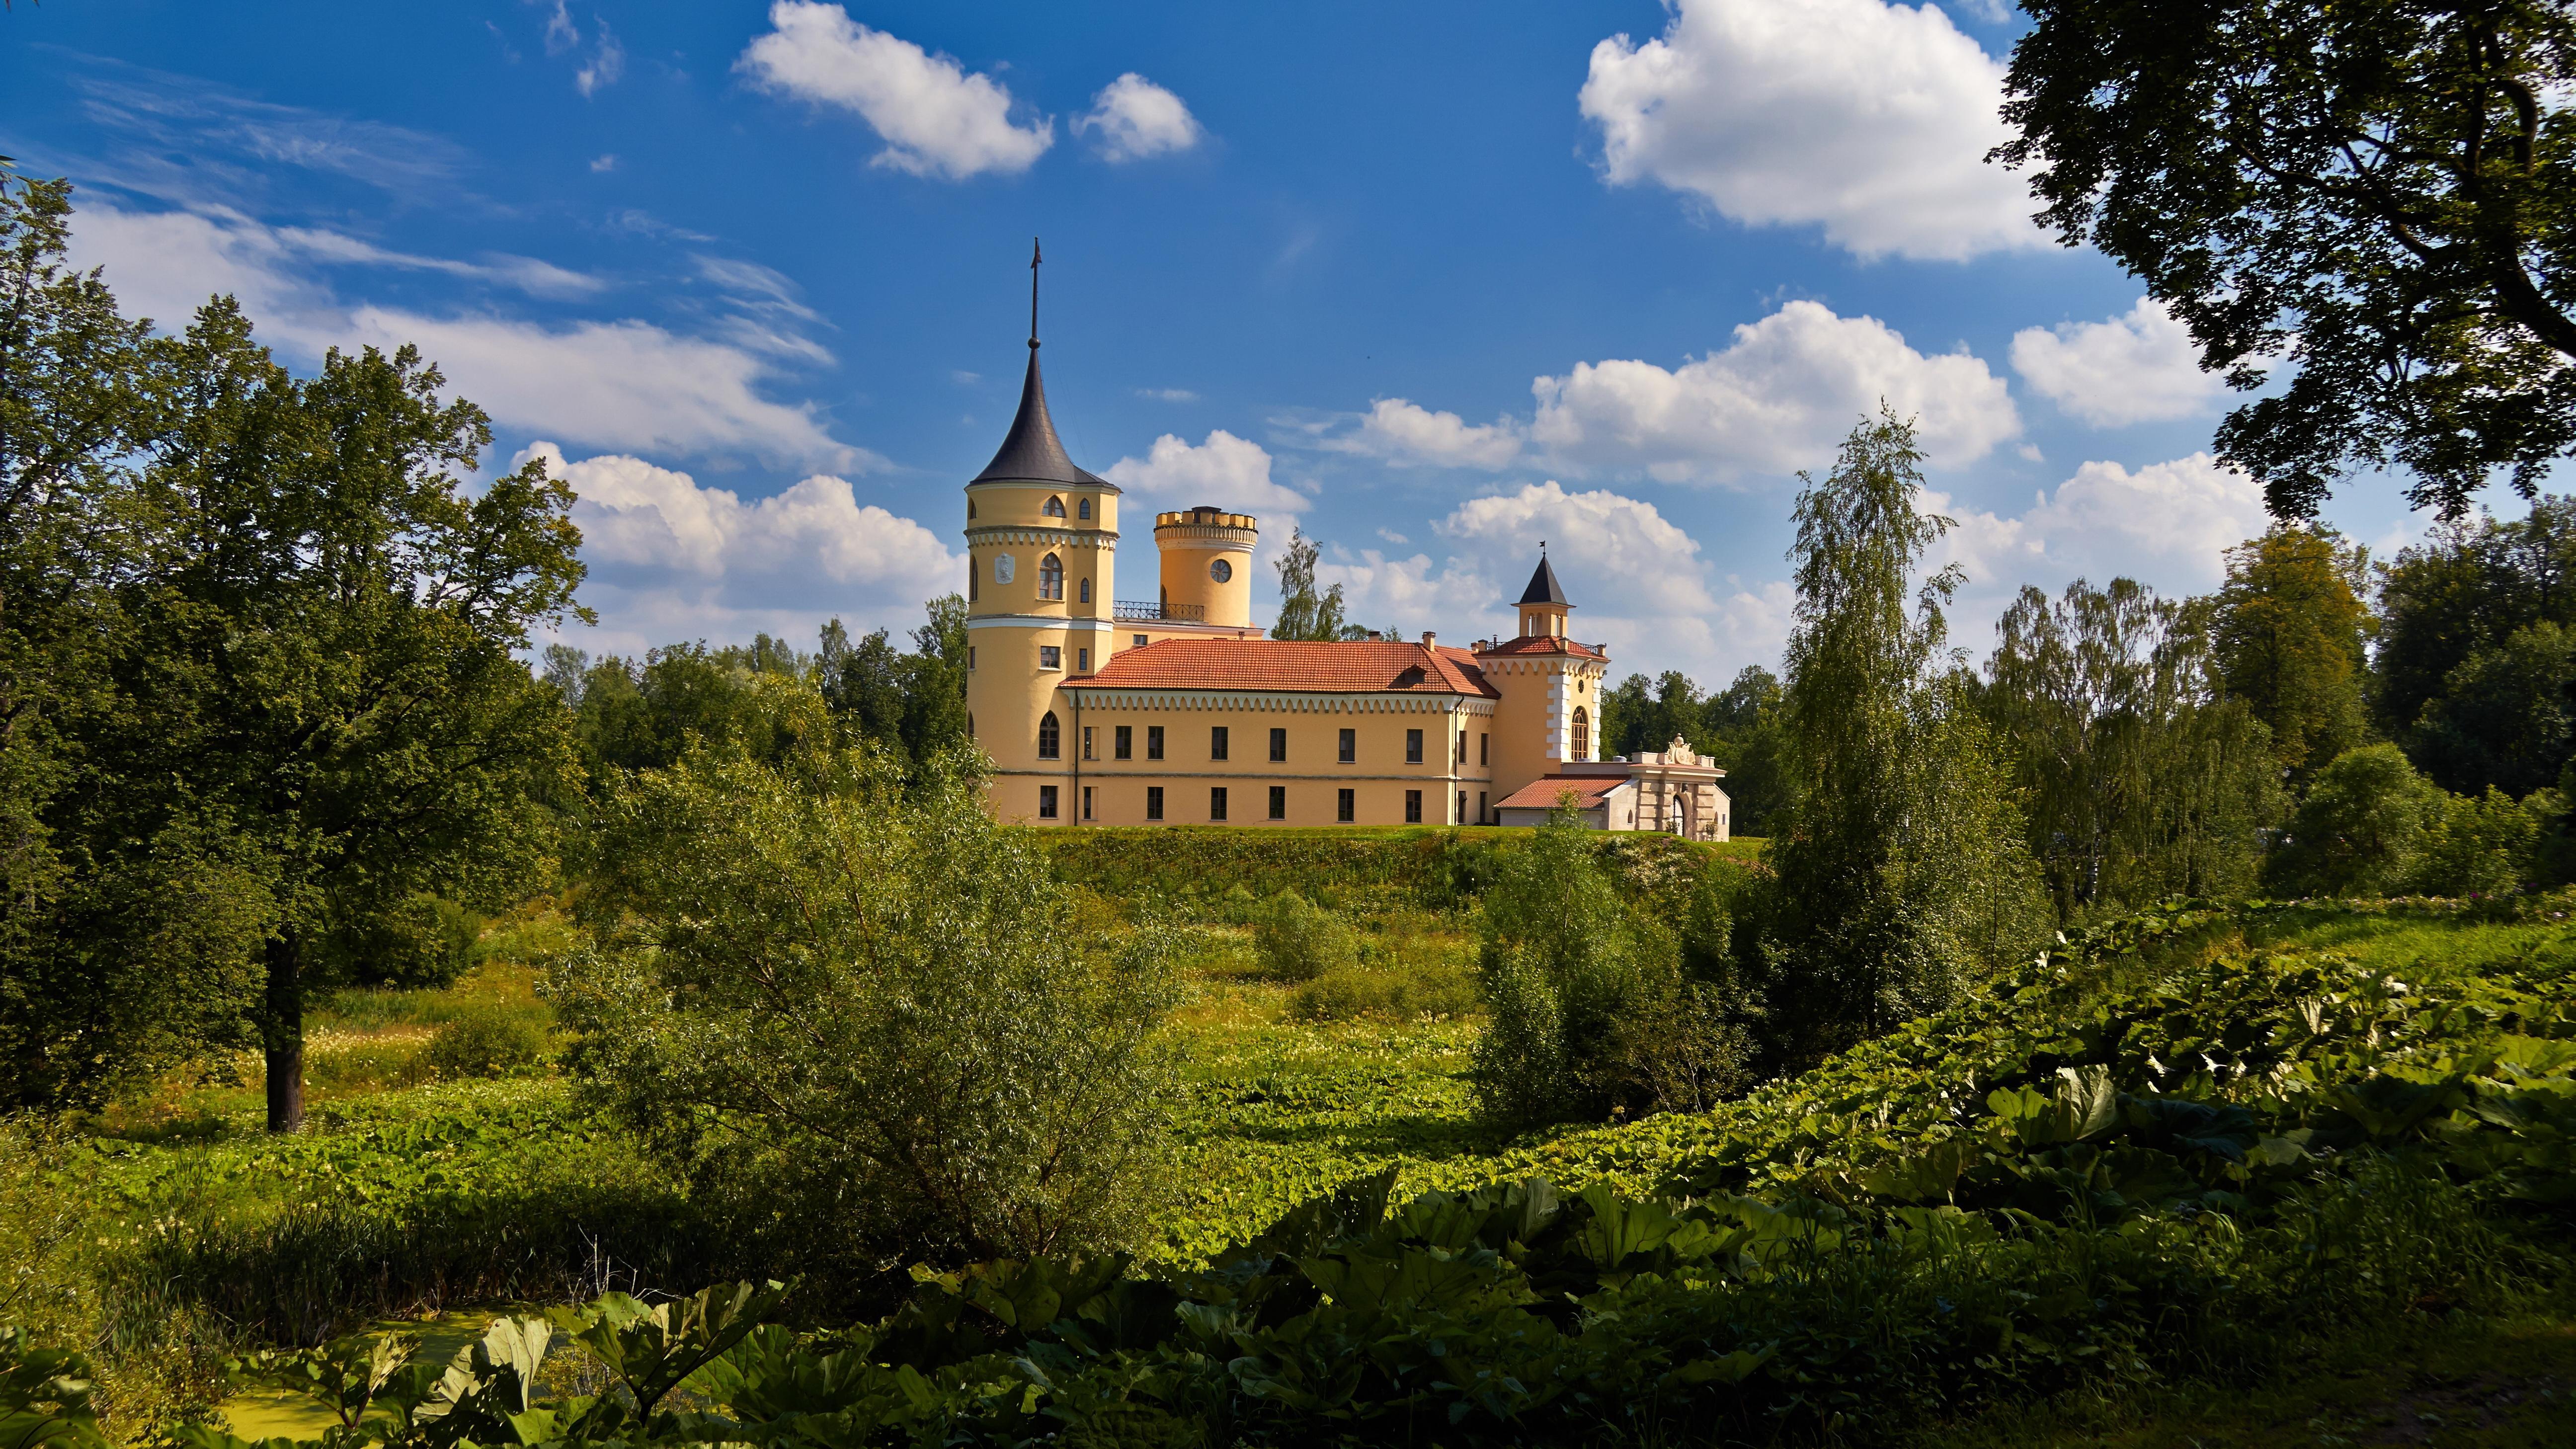 Обои Saint-Petersburg, Pavlovsk Park, Castle Mariental, Санкт-Петербург